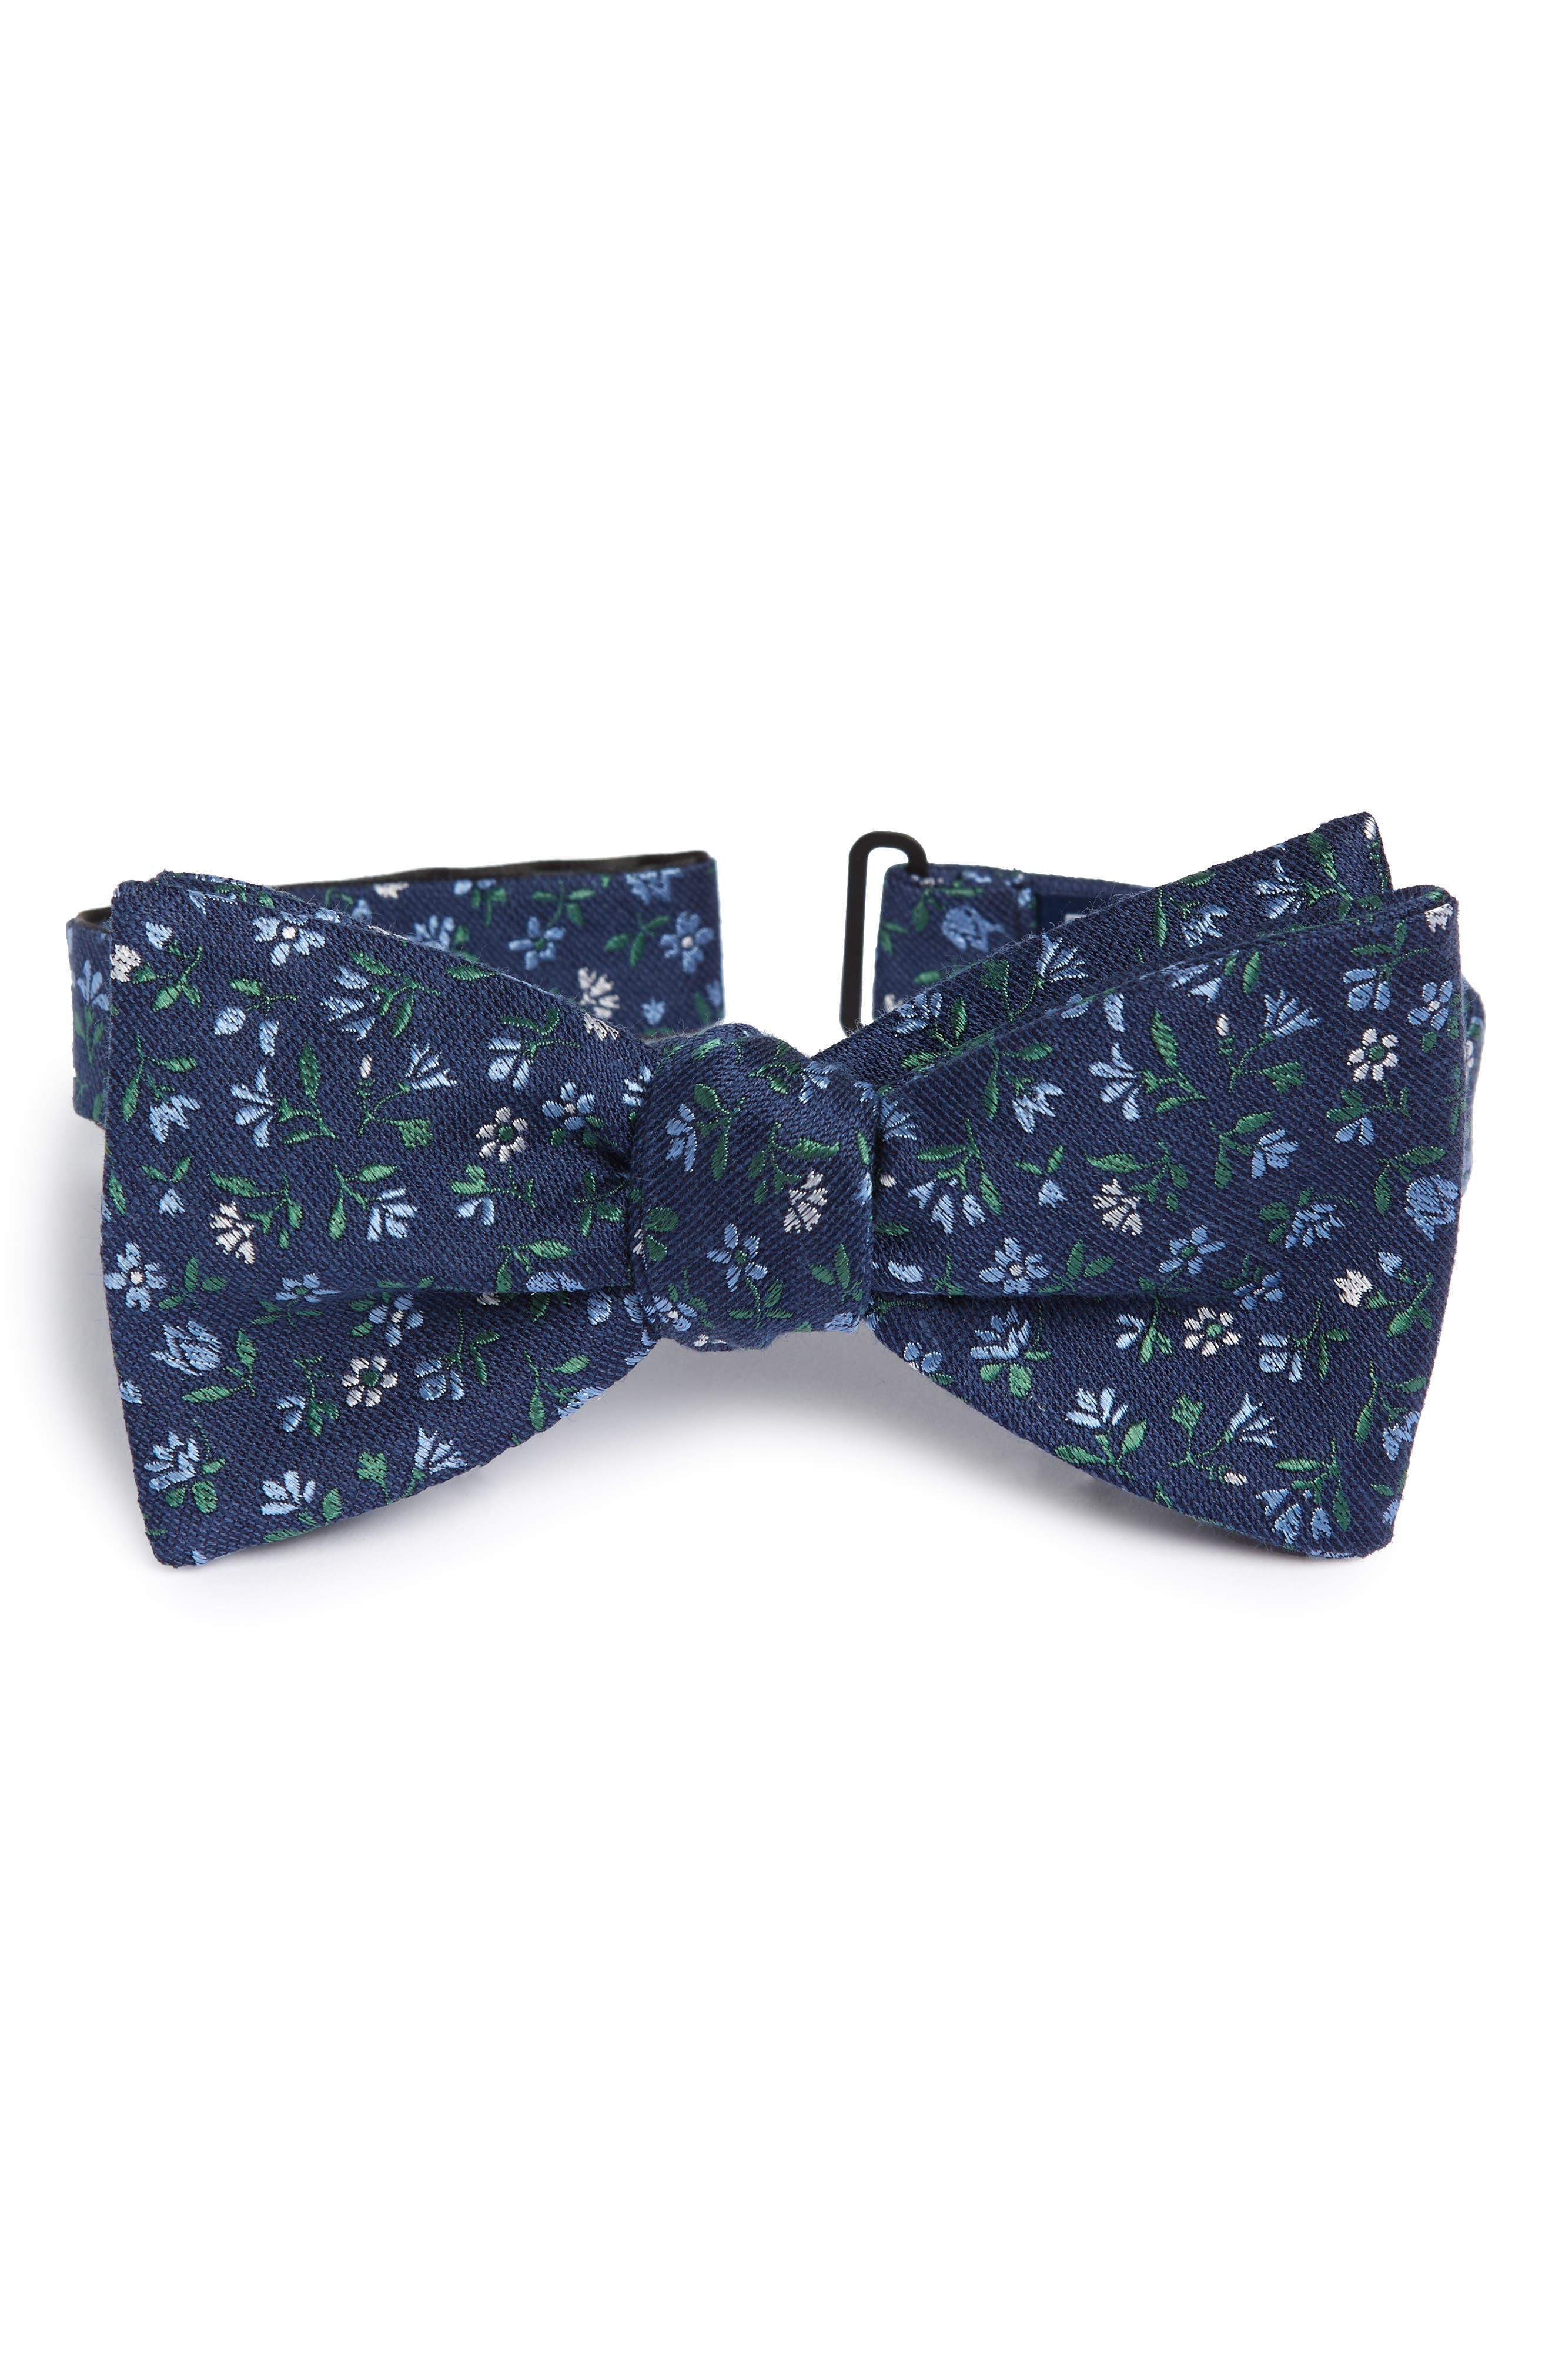 Floral Acres Bow Tie,                             Main thumbnail 1, color,                             Navy